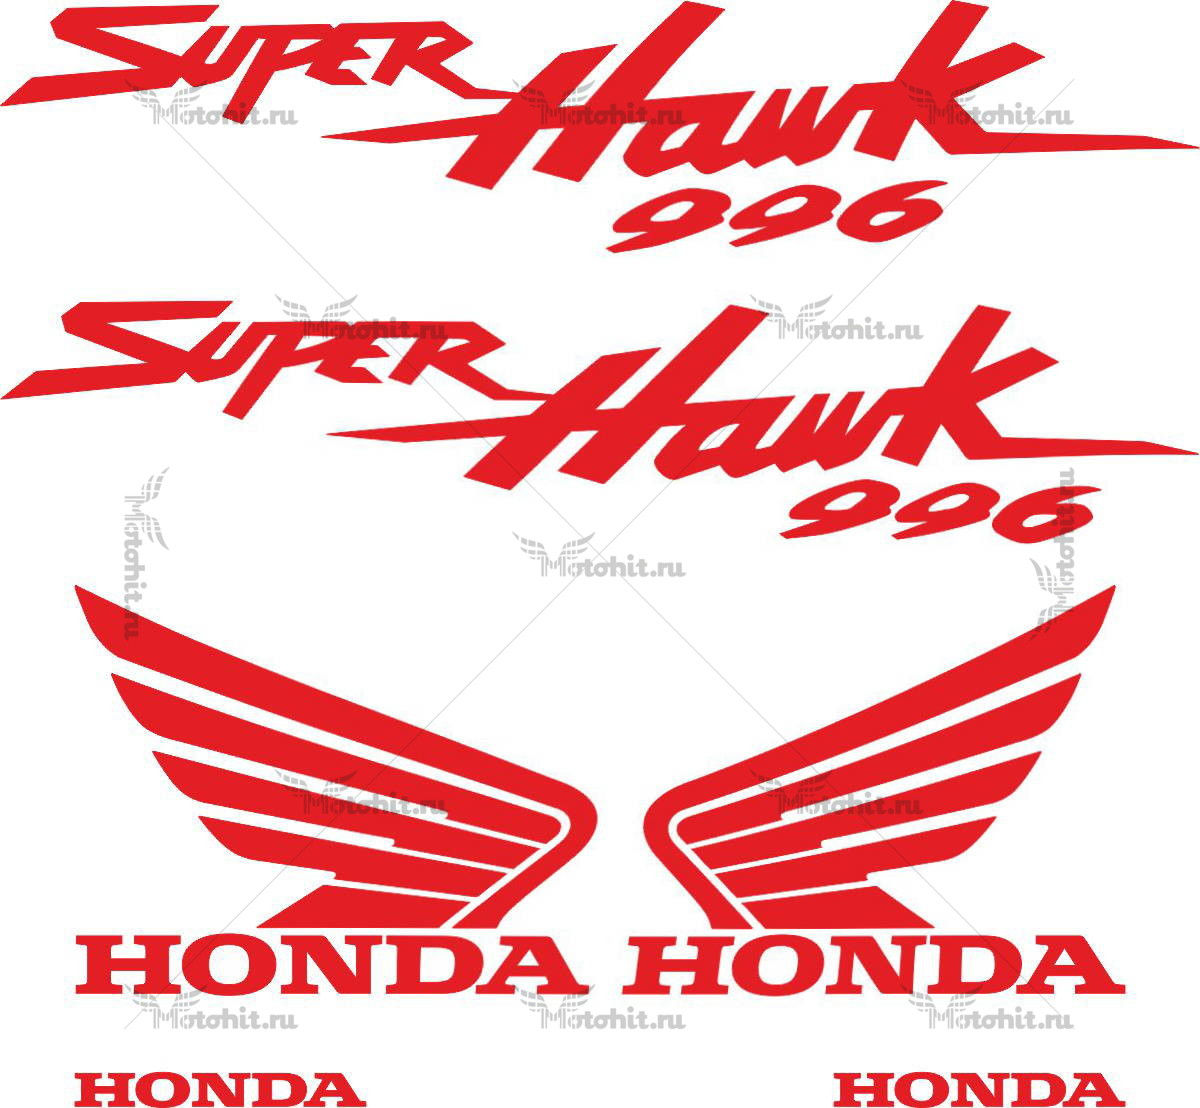 Комплект наклеек Honda VTR-1000-F-996 SUPERHAWK